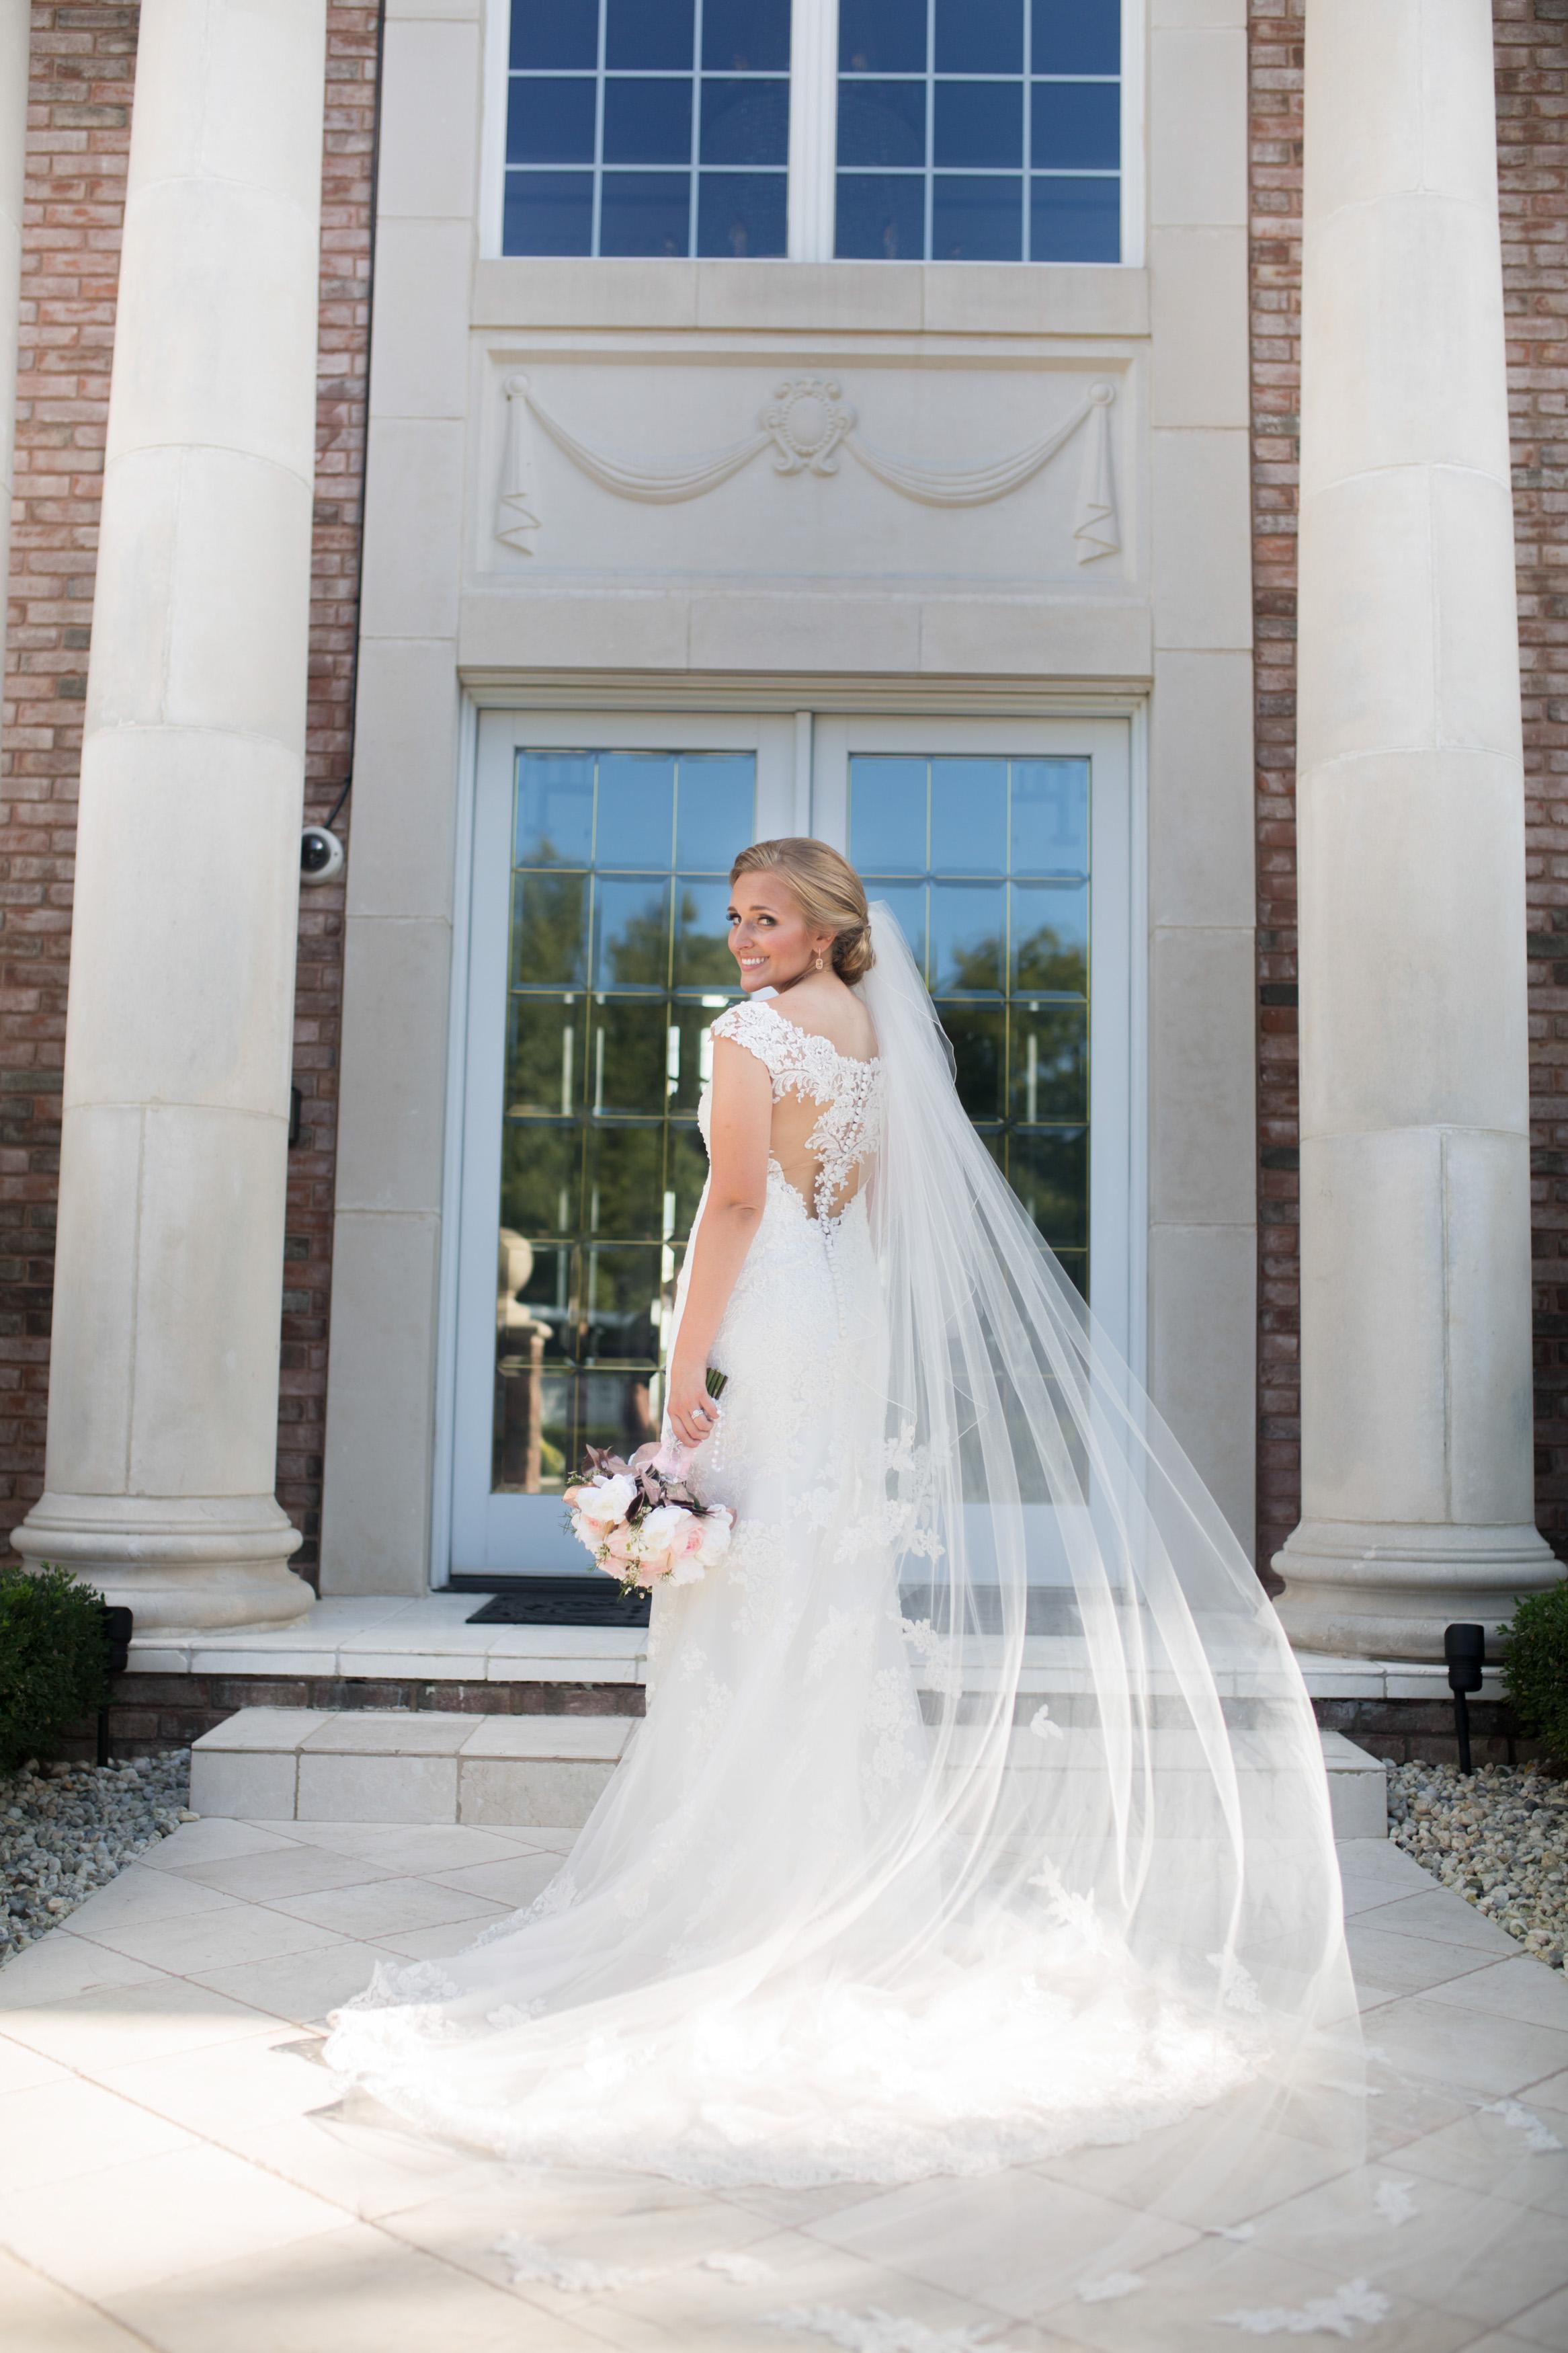 Lustig Wedding 5D 1303.jpg